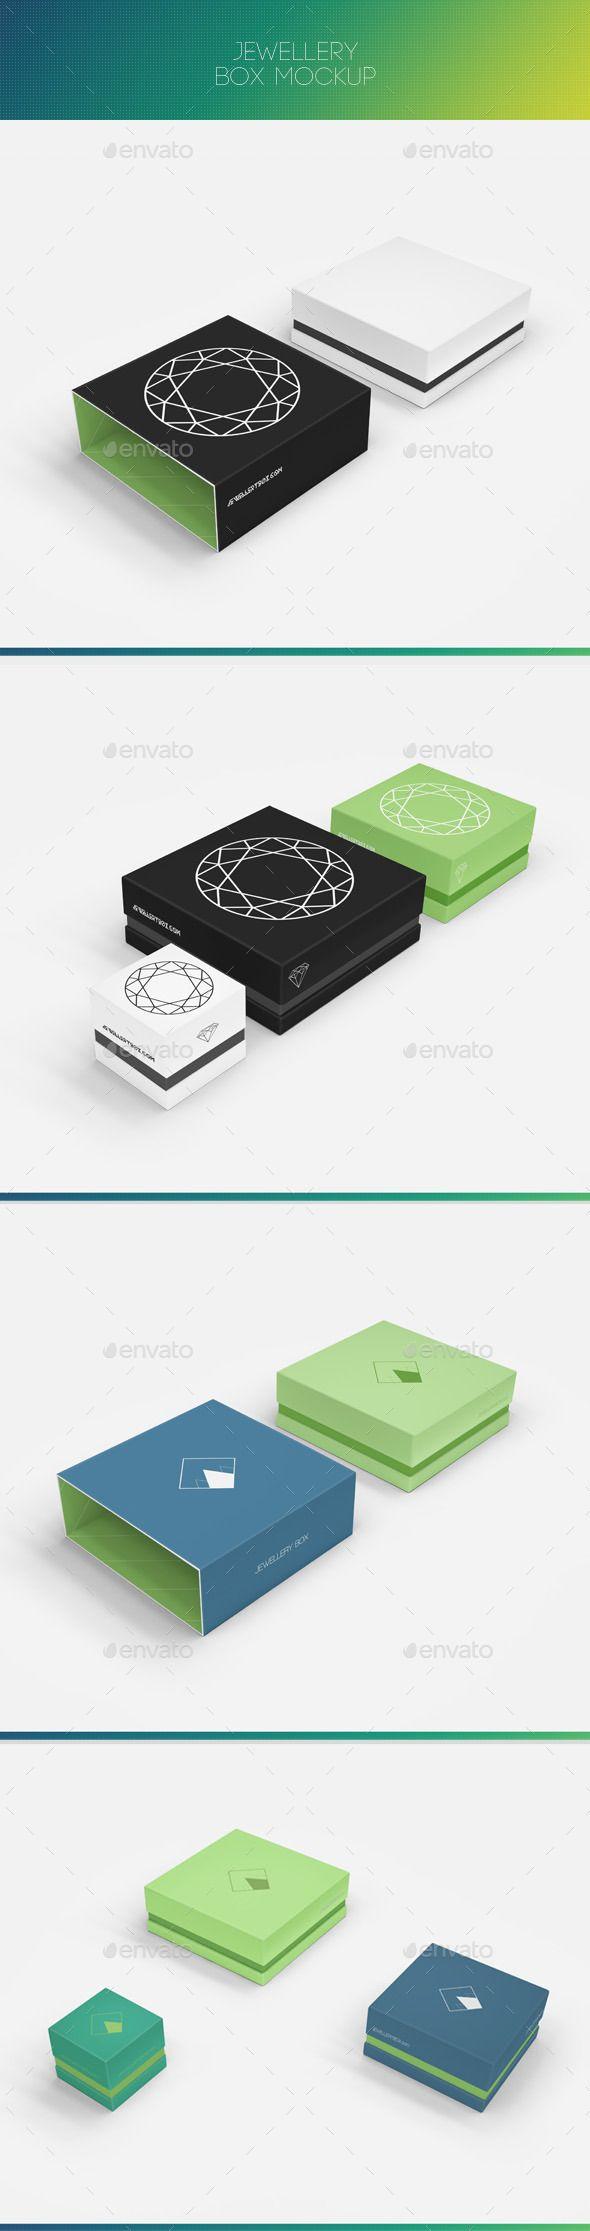 Jewellery Box Mock-up | #boxmockup | Download: http://graphicriver.net/item/jewellery-box-mockup/9269397?ref=ksioks